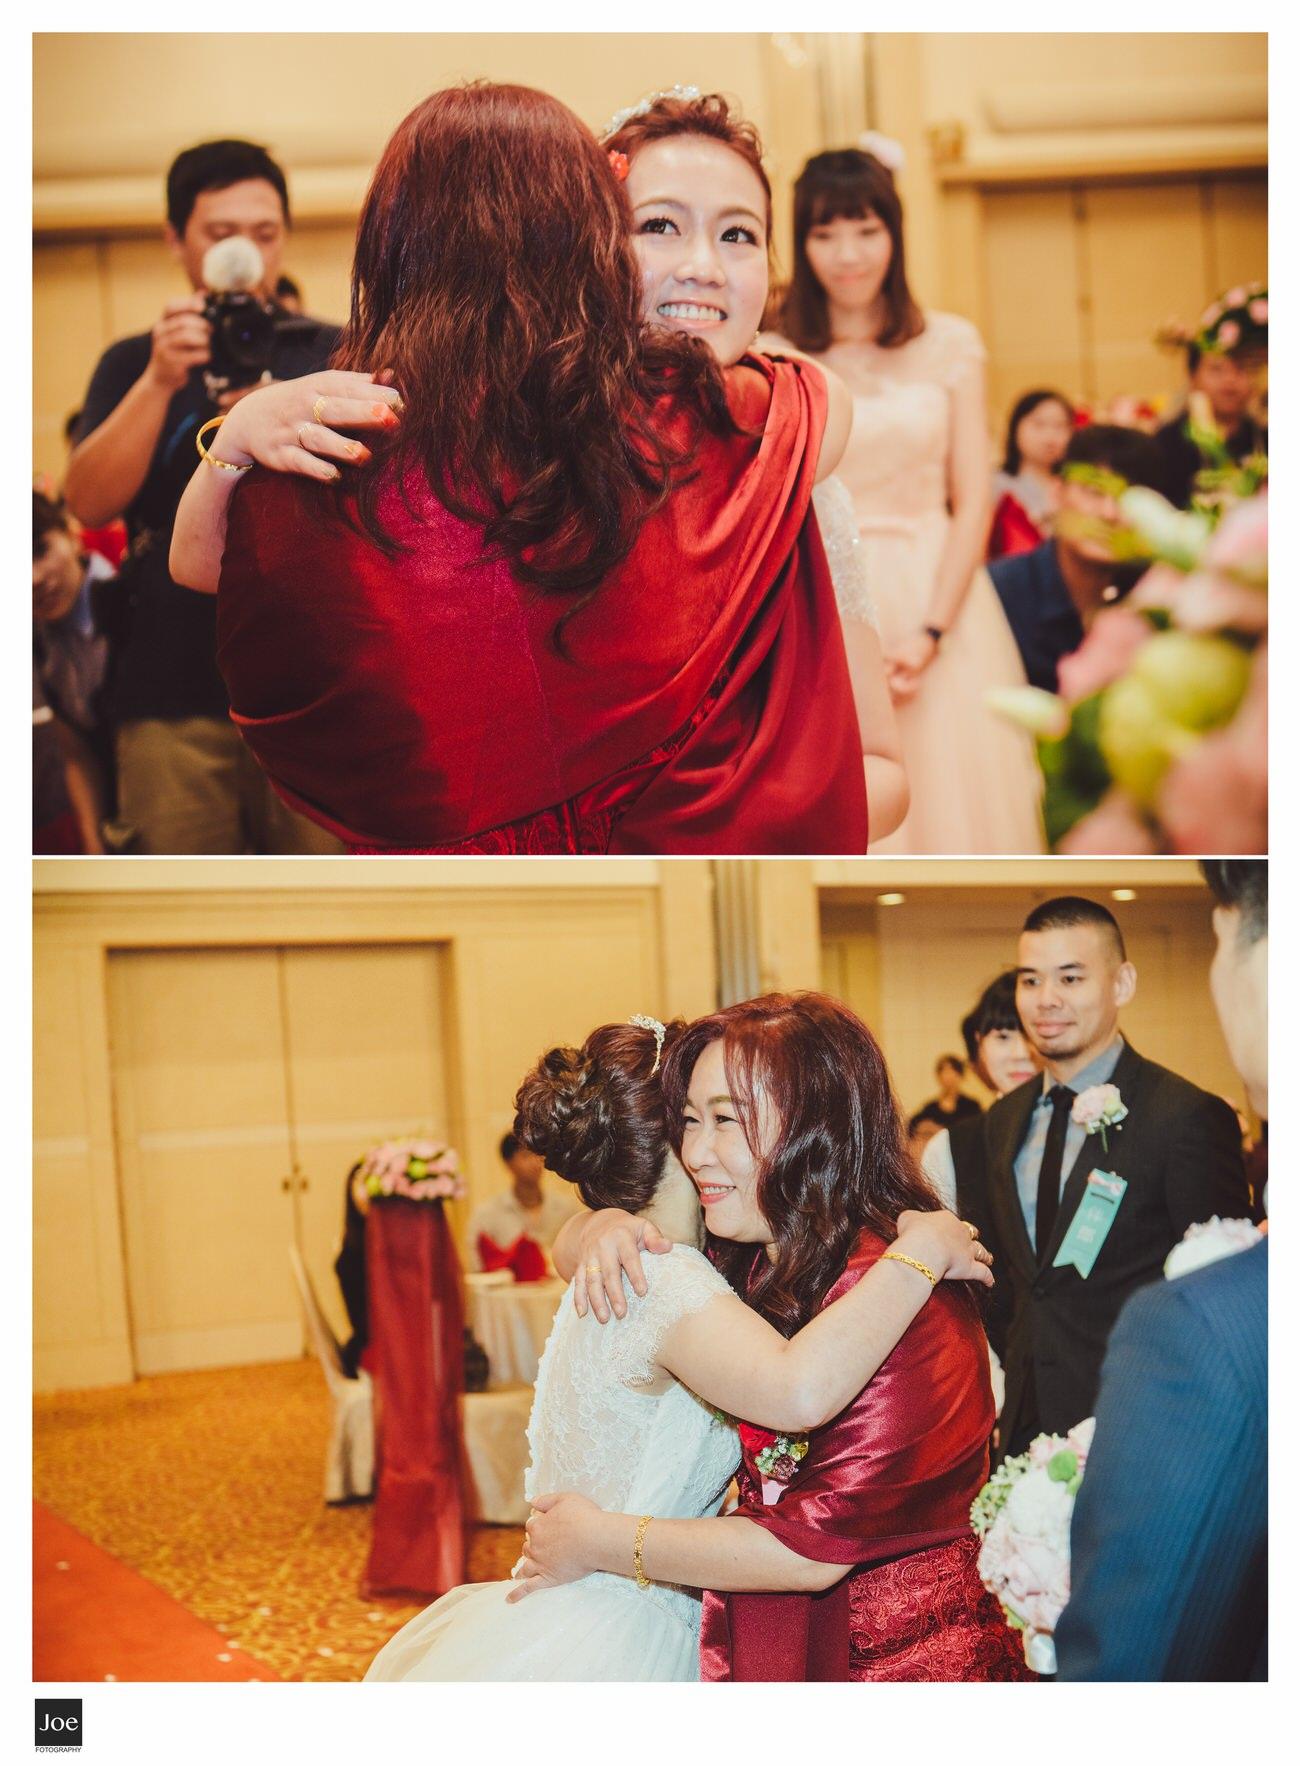 sunworld-dynasty-hotel-taipei-wedding-photo-joe-fotography-angel-jay-083.jpg